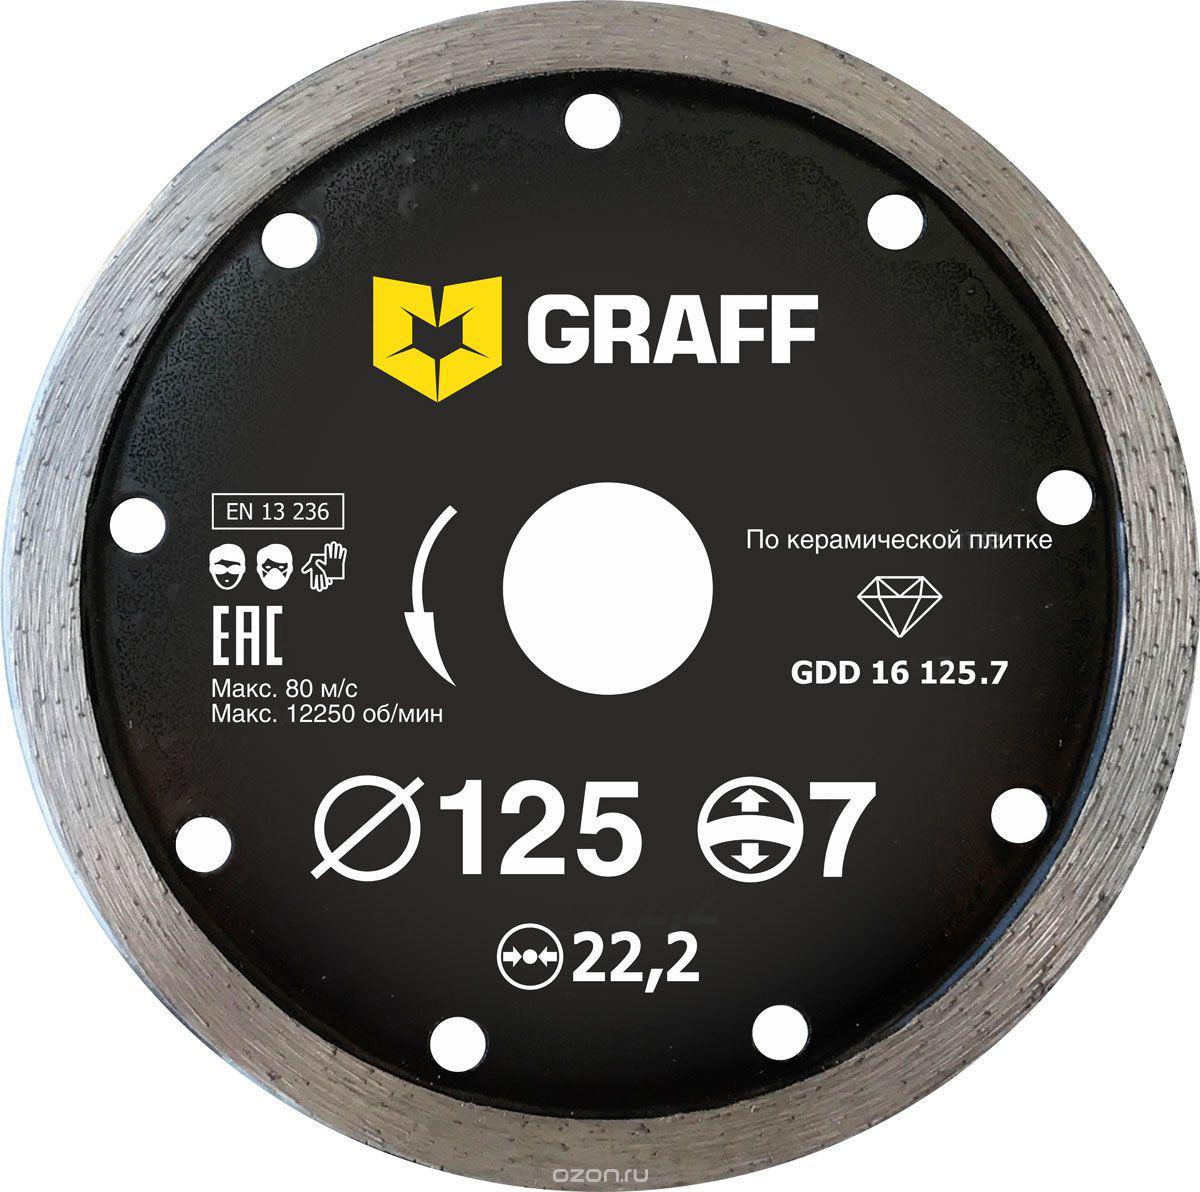 Картинка для Круг алмазный Graff Gdd 16 125.7